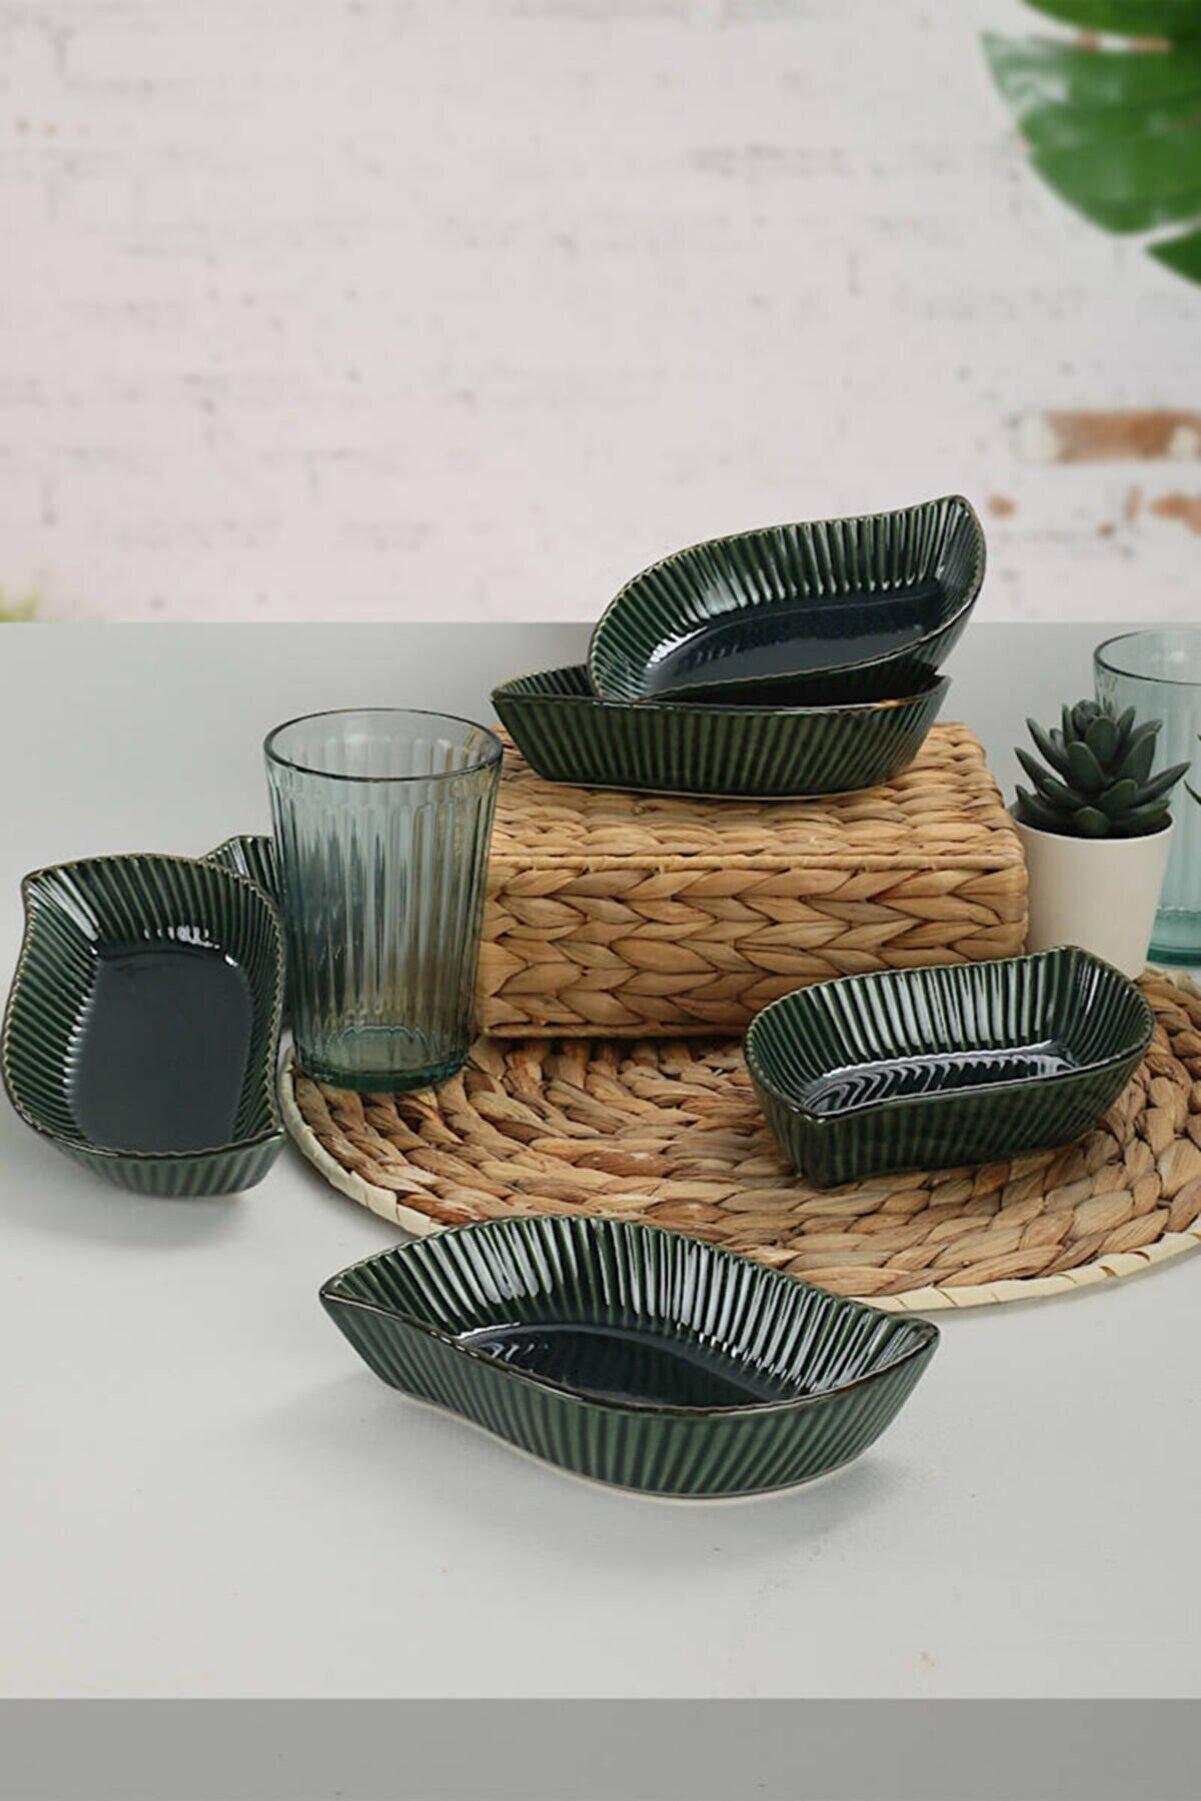 Keramika Zümrüt Yaprak Rolyefli Çerezlik / Sosluk 17 Cm 6 Adet